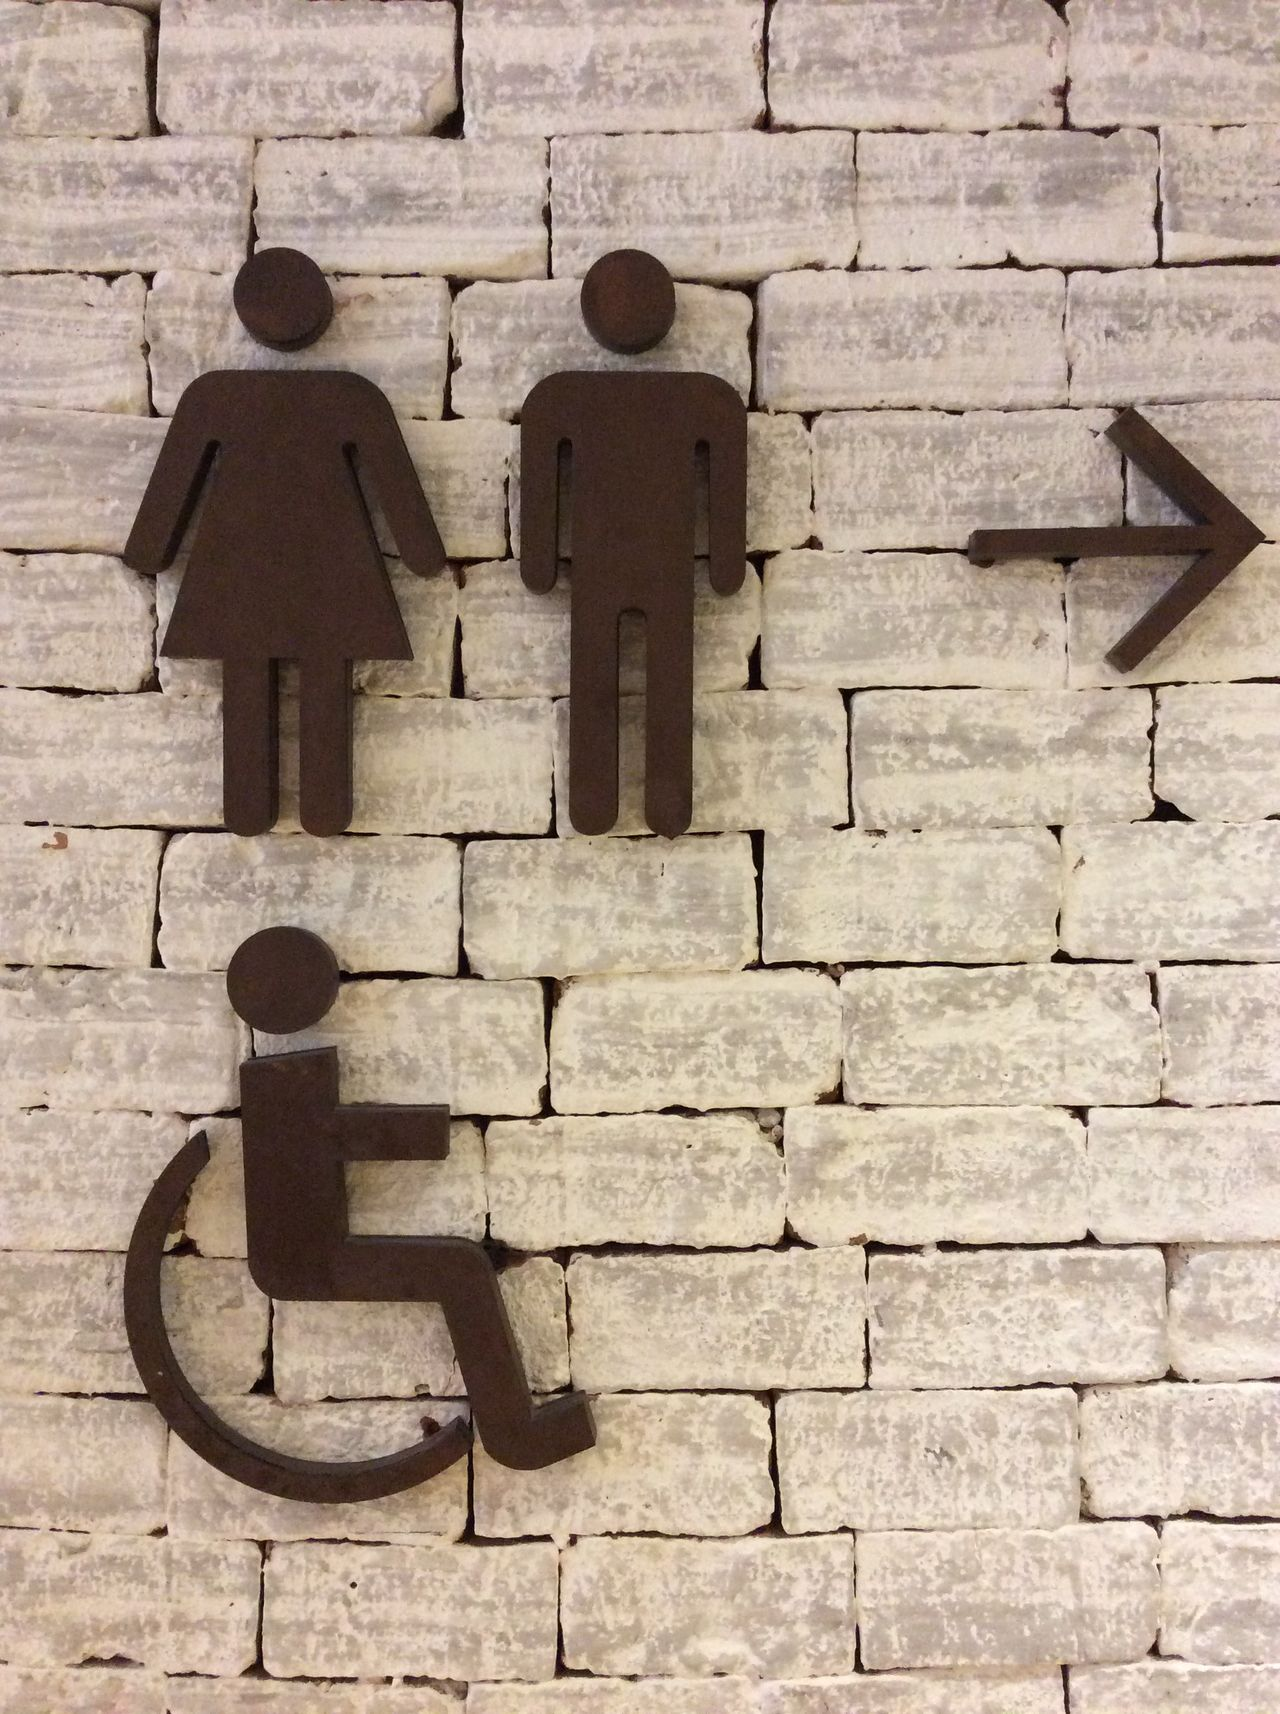 Bangkok Thailand. Signage Men Women Disabled Arrow pointing right Restroom Signage Interior Brick Wall White